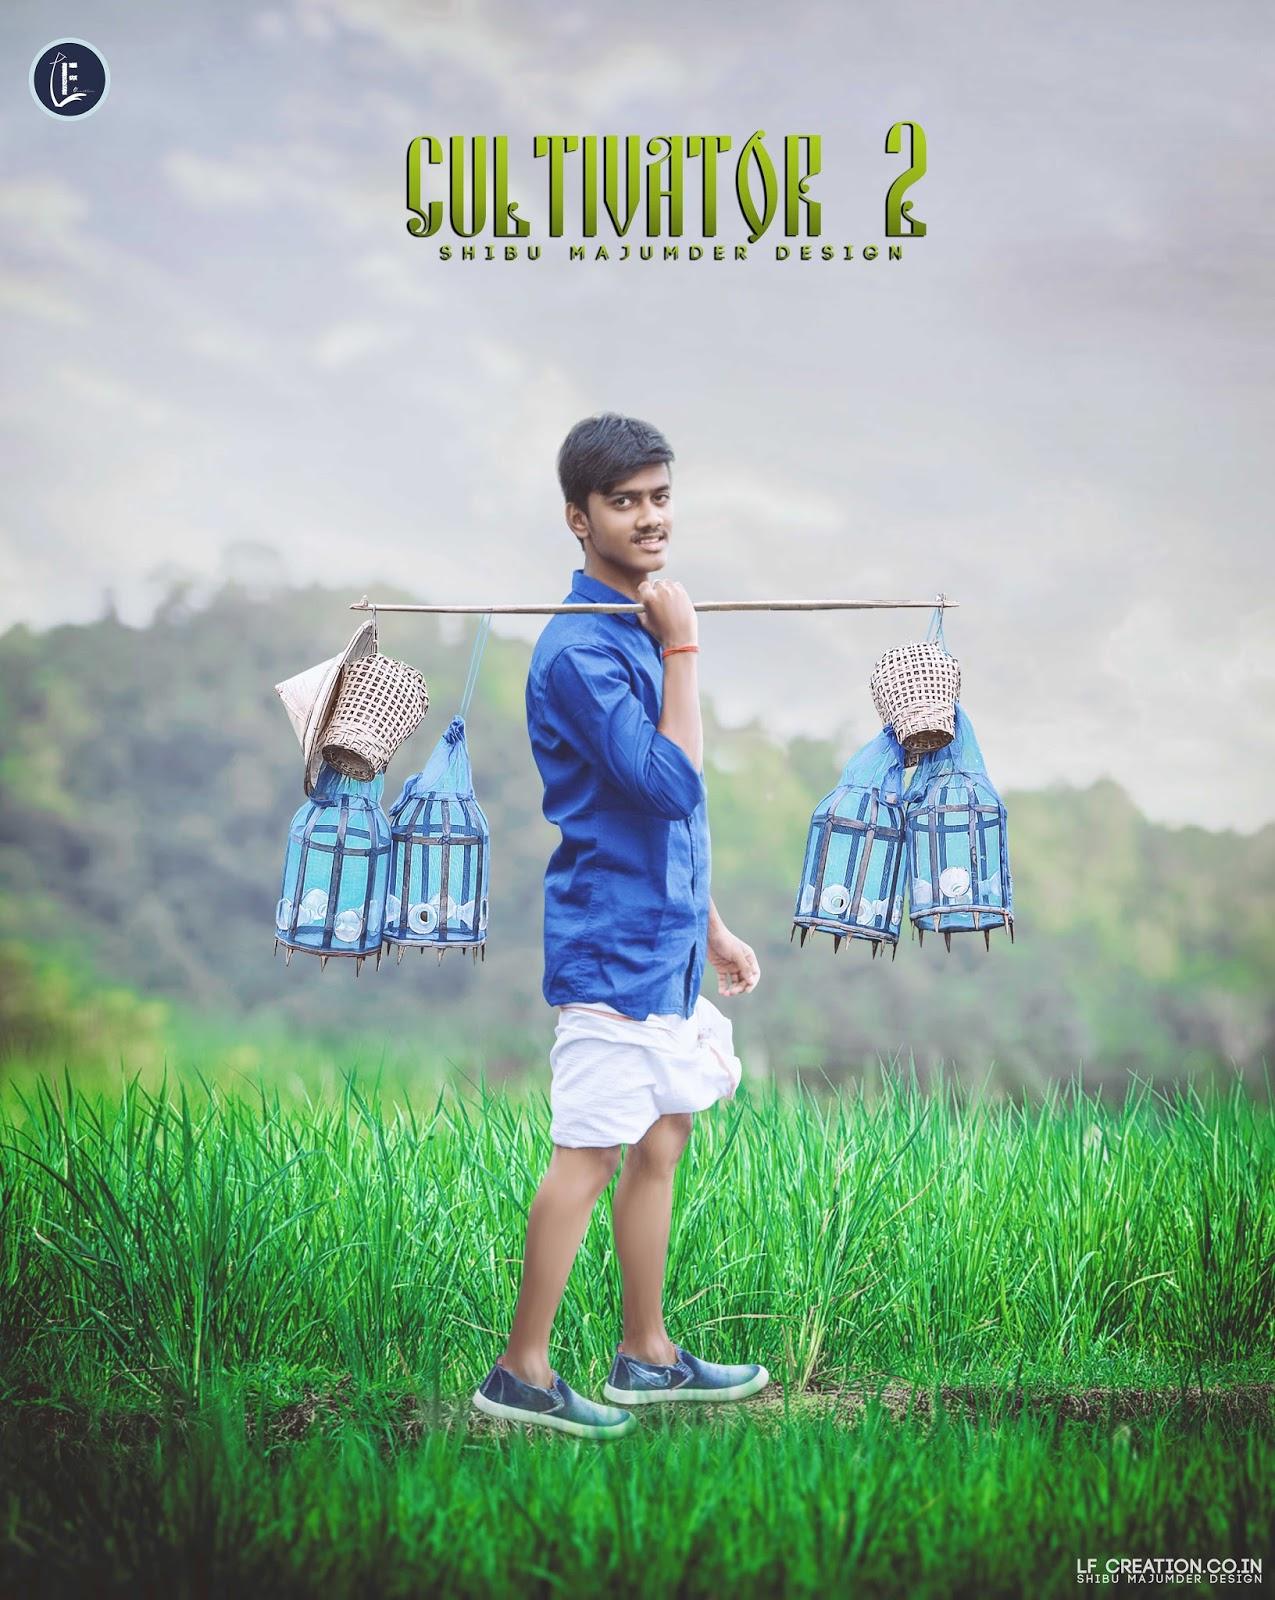 Cultivator boy poster design photoshop tutorial 2017 lf creation cultivator boy poster design photoshop tutorial 2017 baditri Gallery